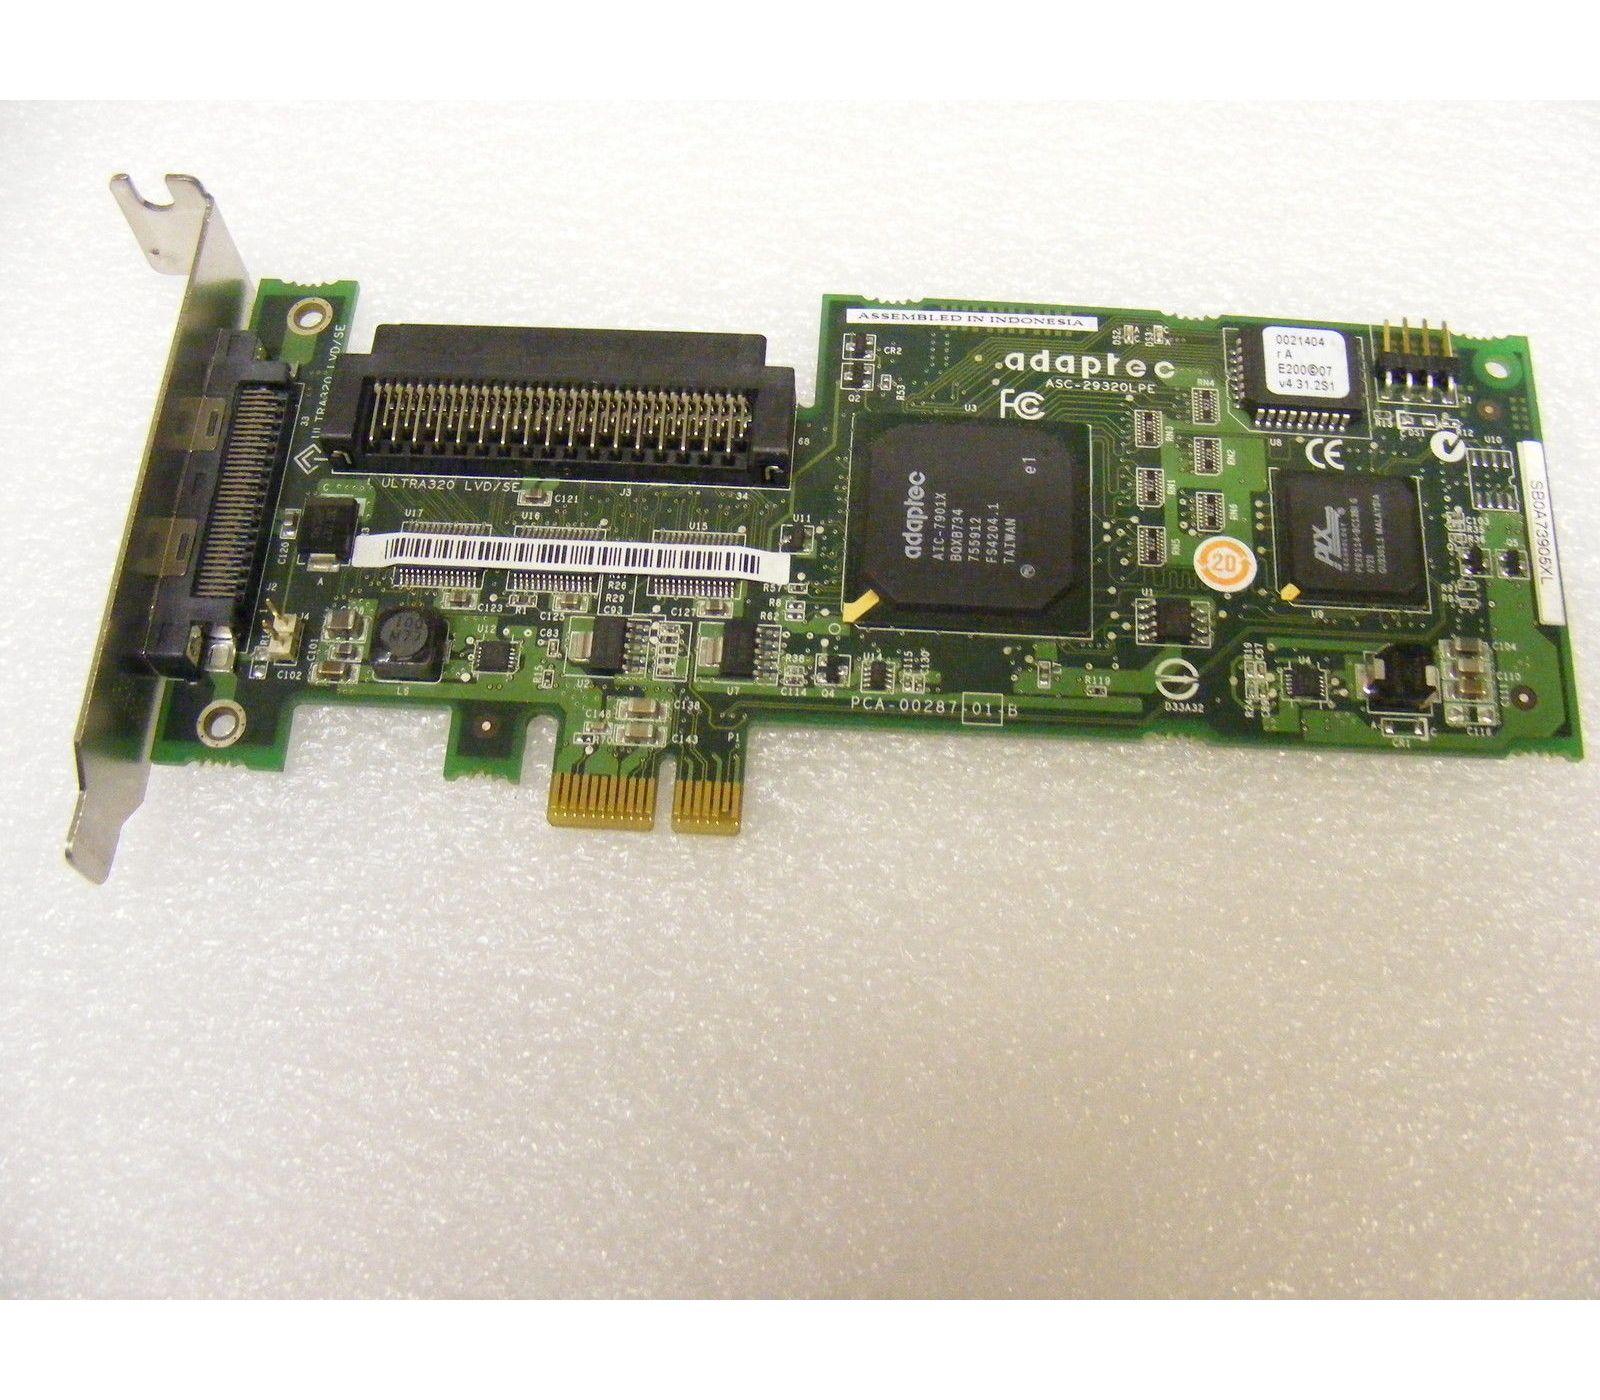 Adaptec 2250300-R U320 SCSI Host Bus Adapter